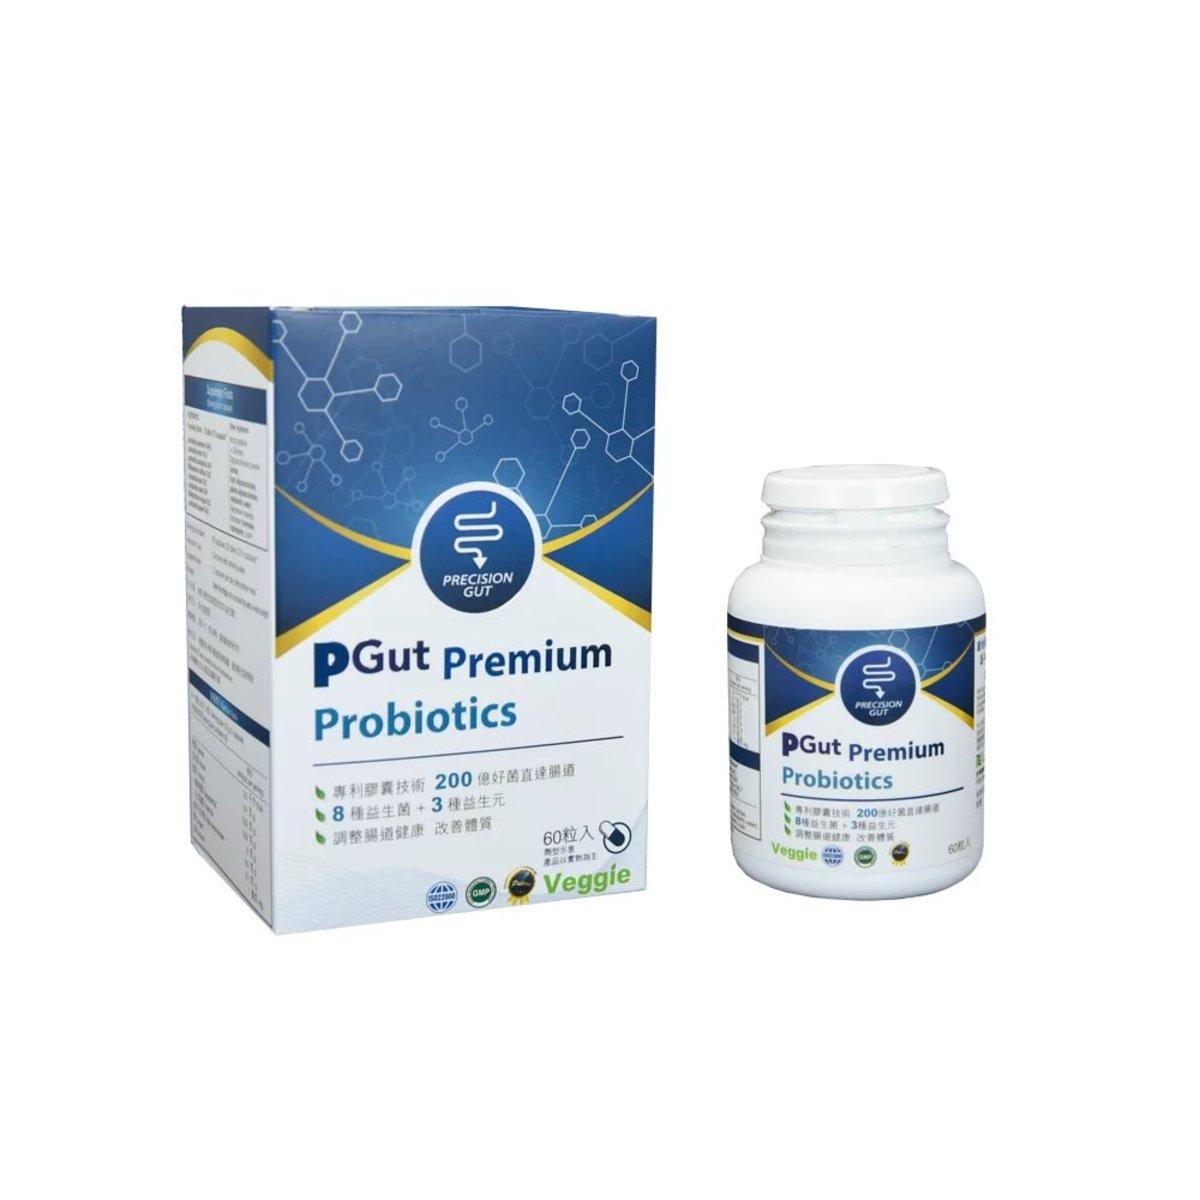 PGut準腸康 Premium 益生菌